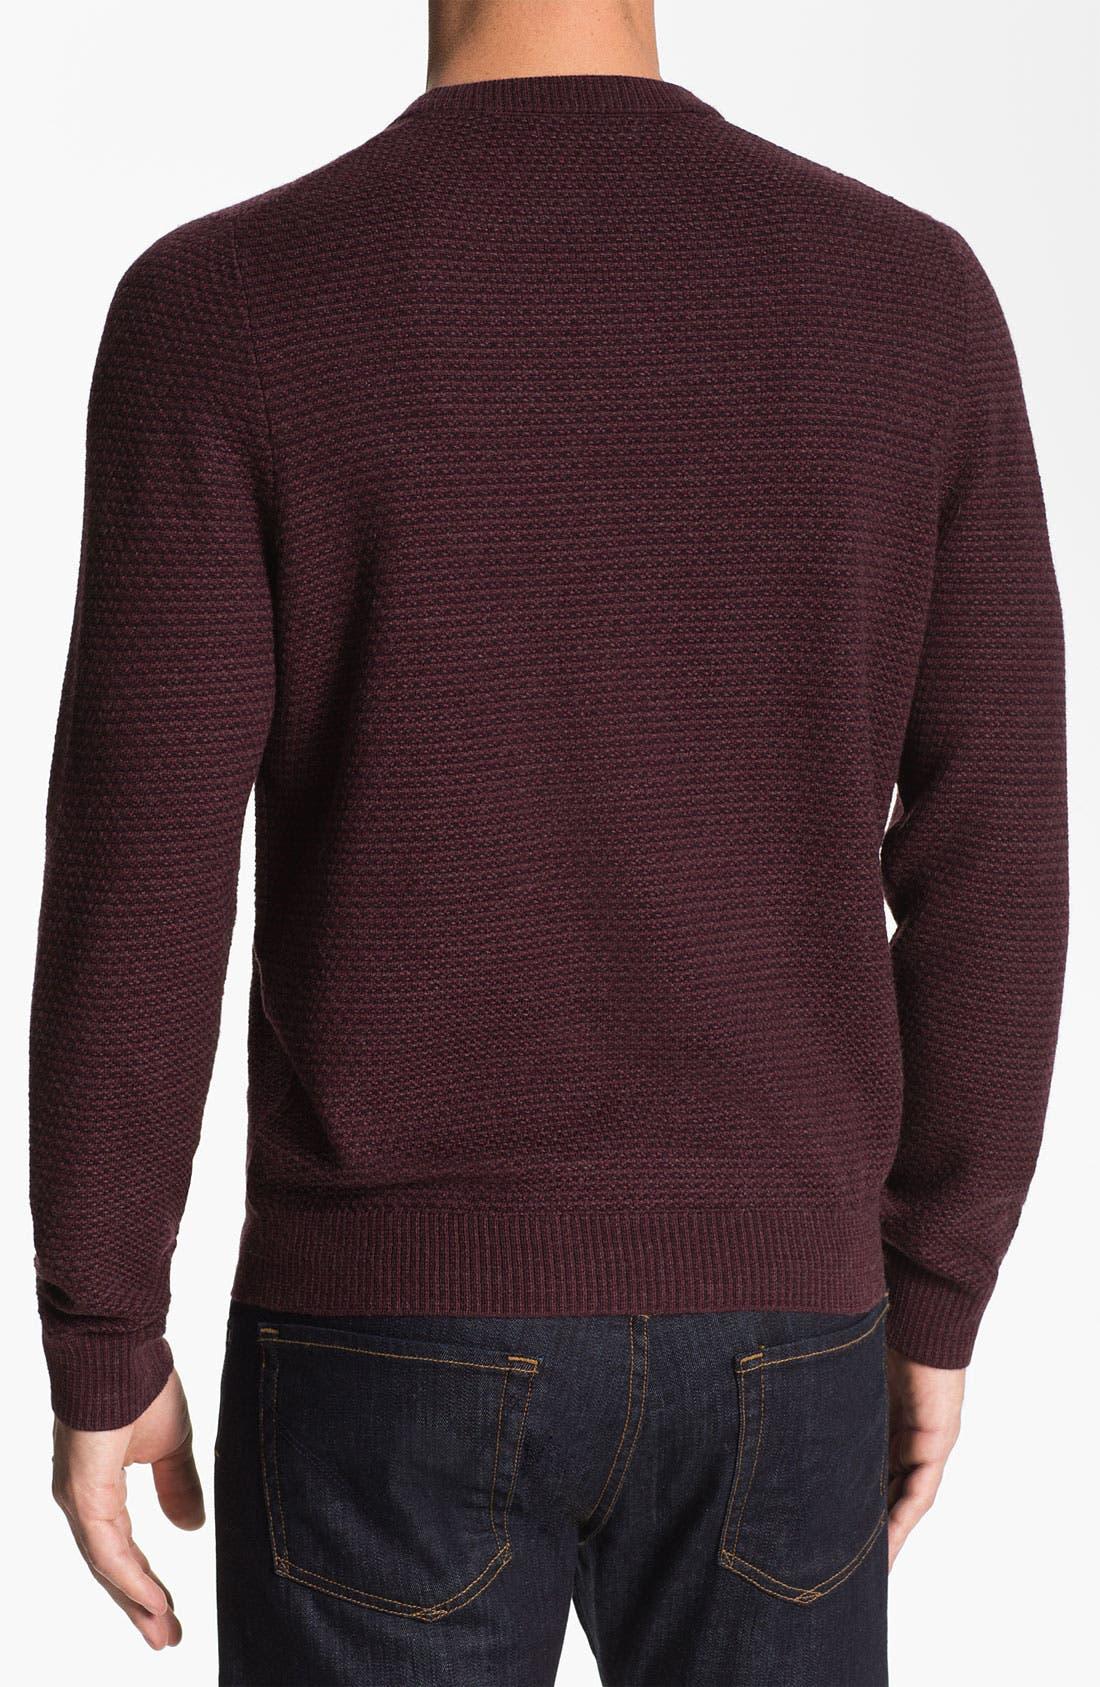 Alternate Image 2  - Nordstrom Merino Wool Crewneck Sweater